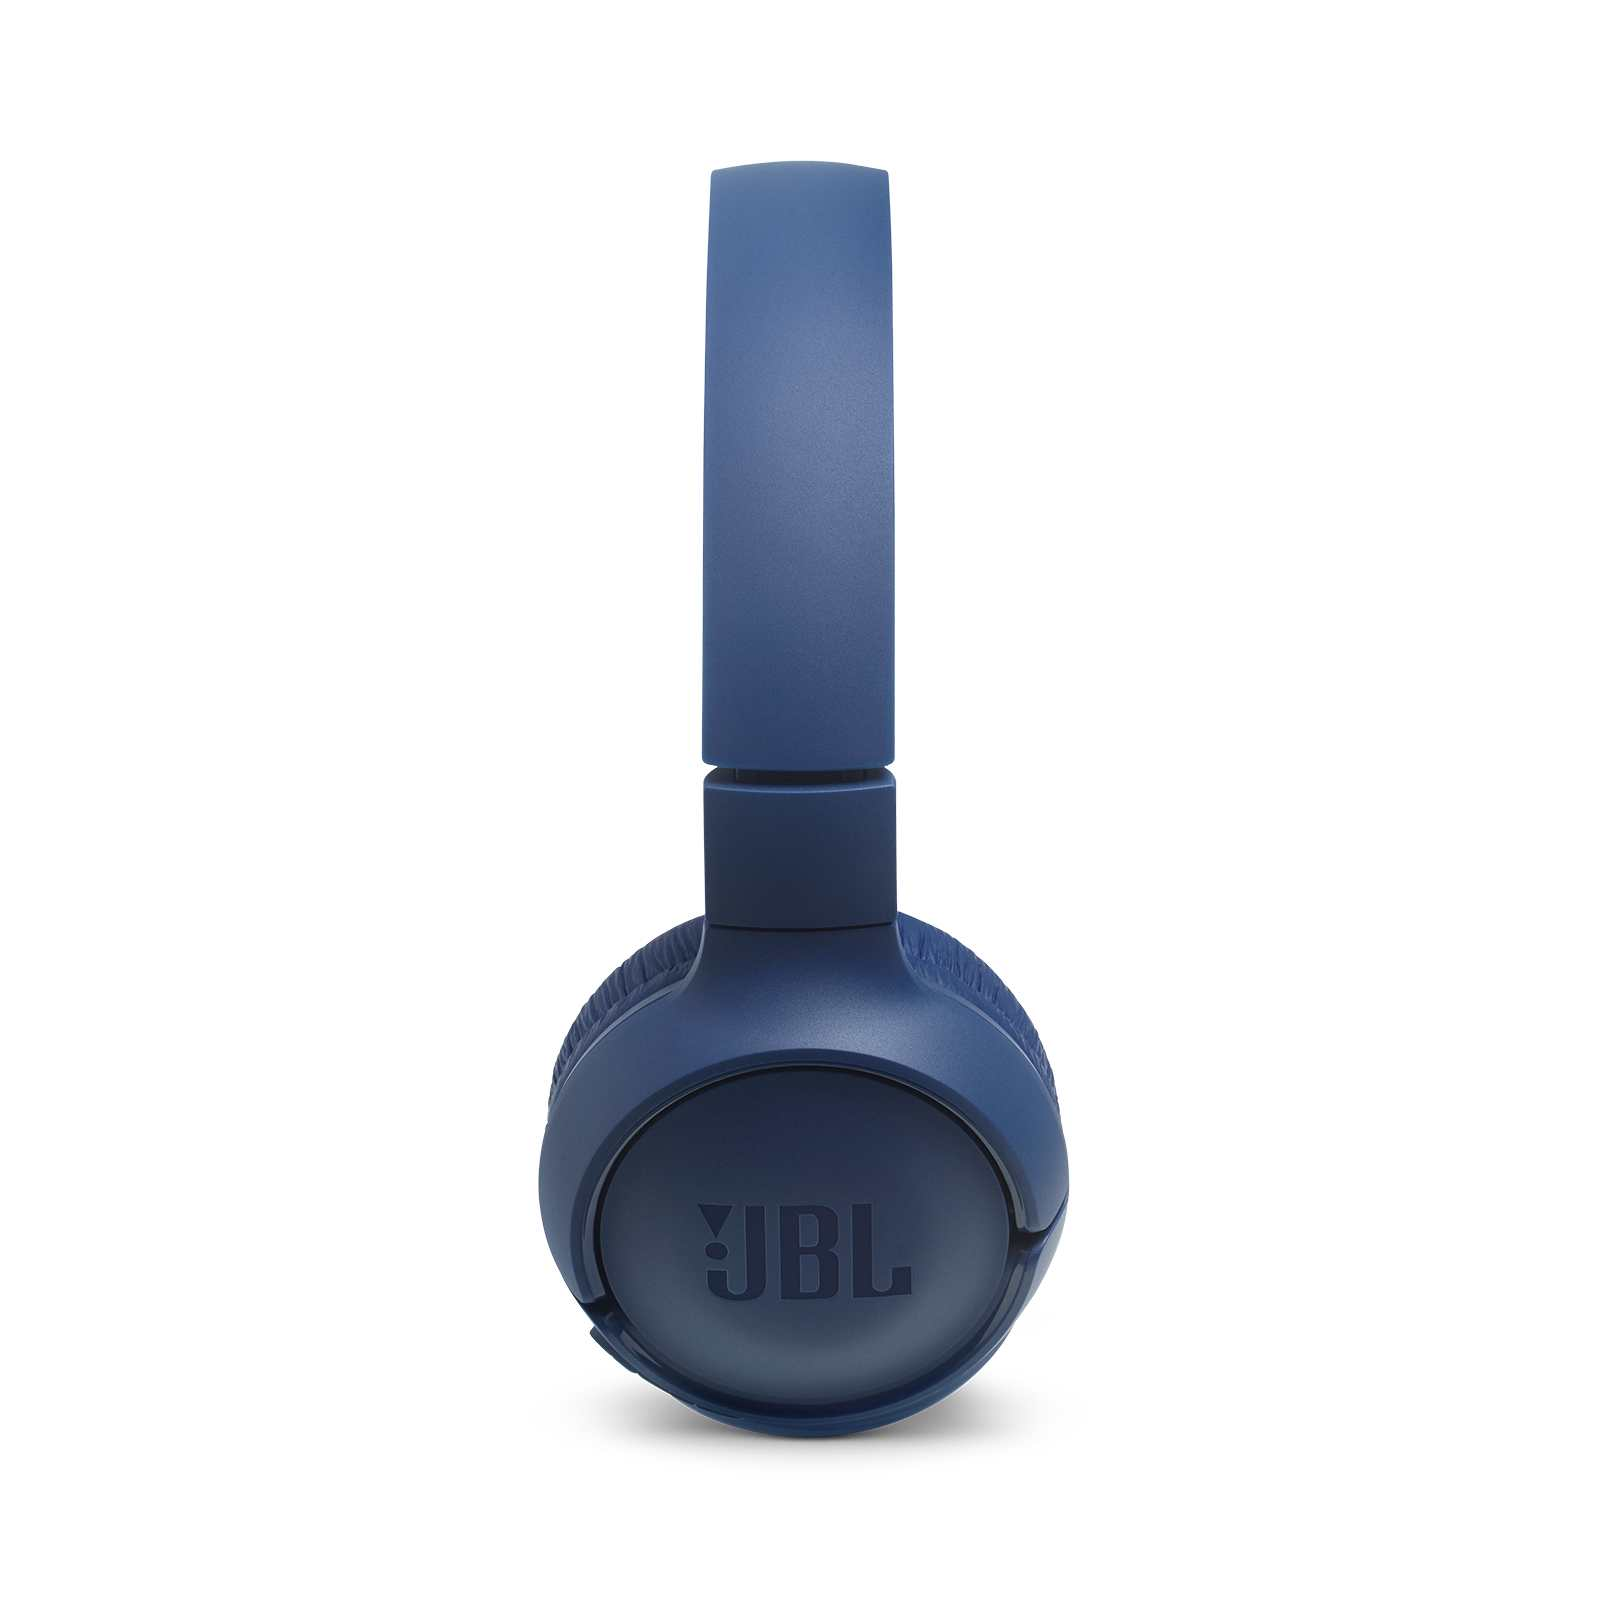 Fone de Ouvido Bluetooth JBL Tune 500BT - Azul JBLT500BTBLU